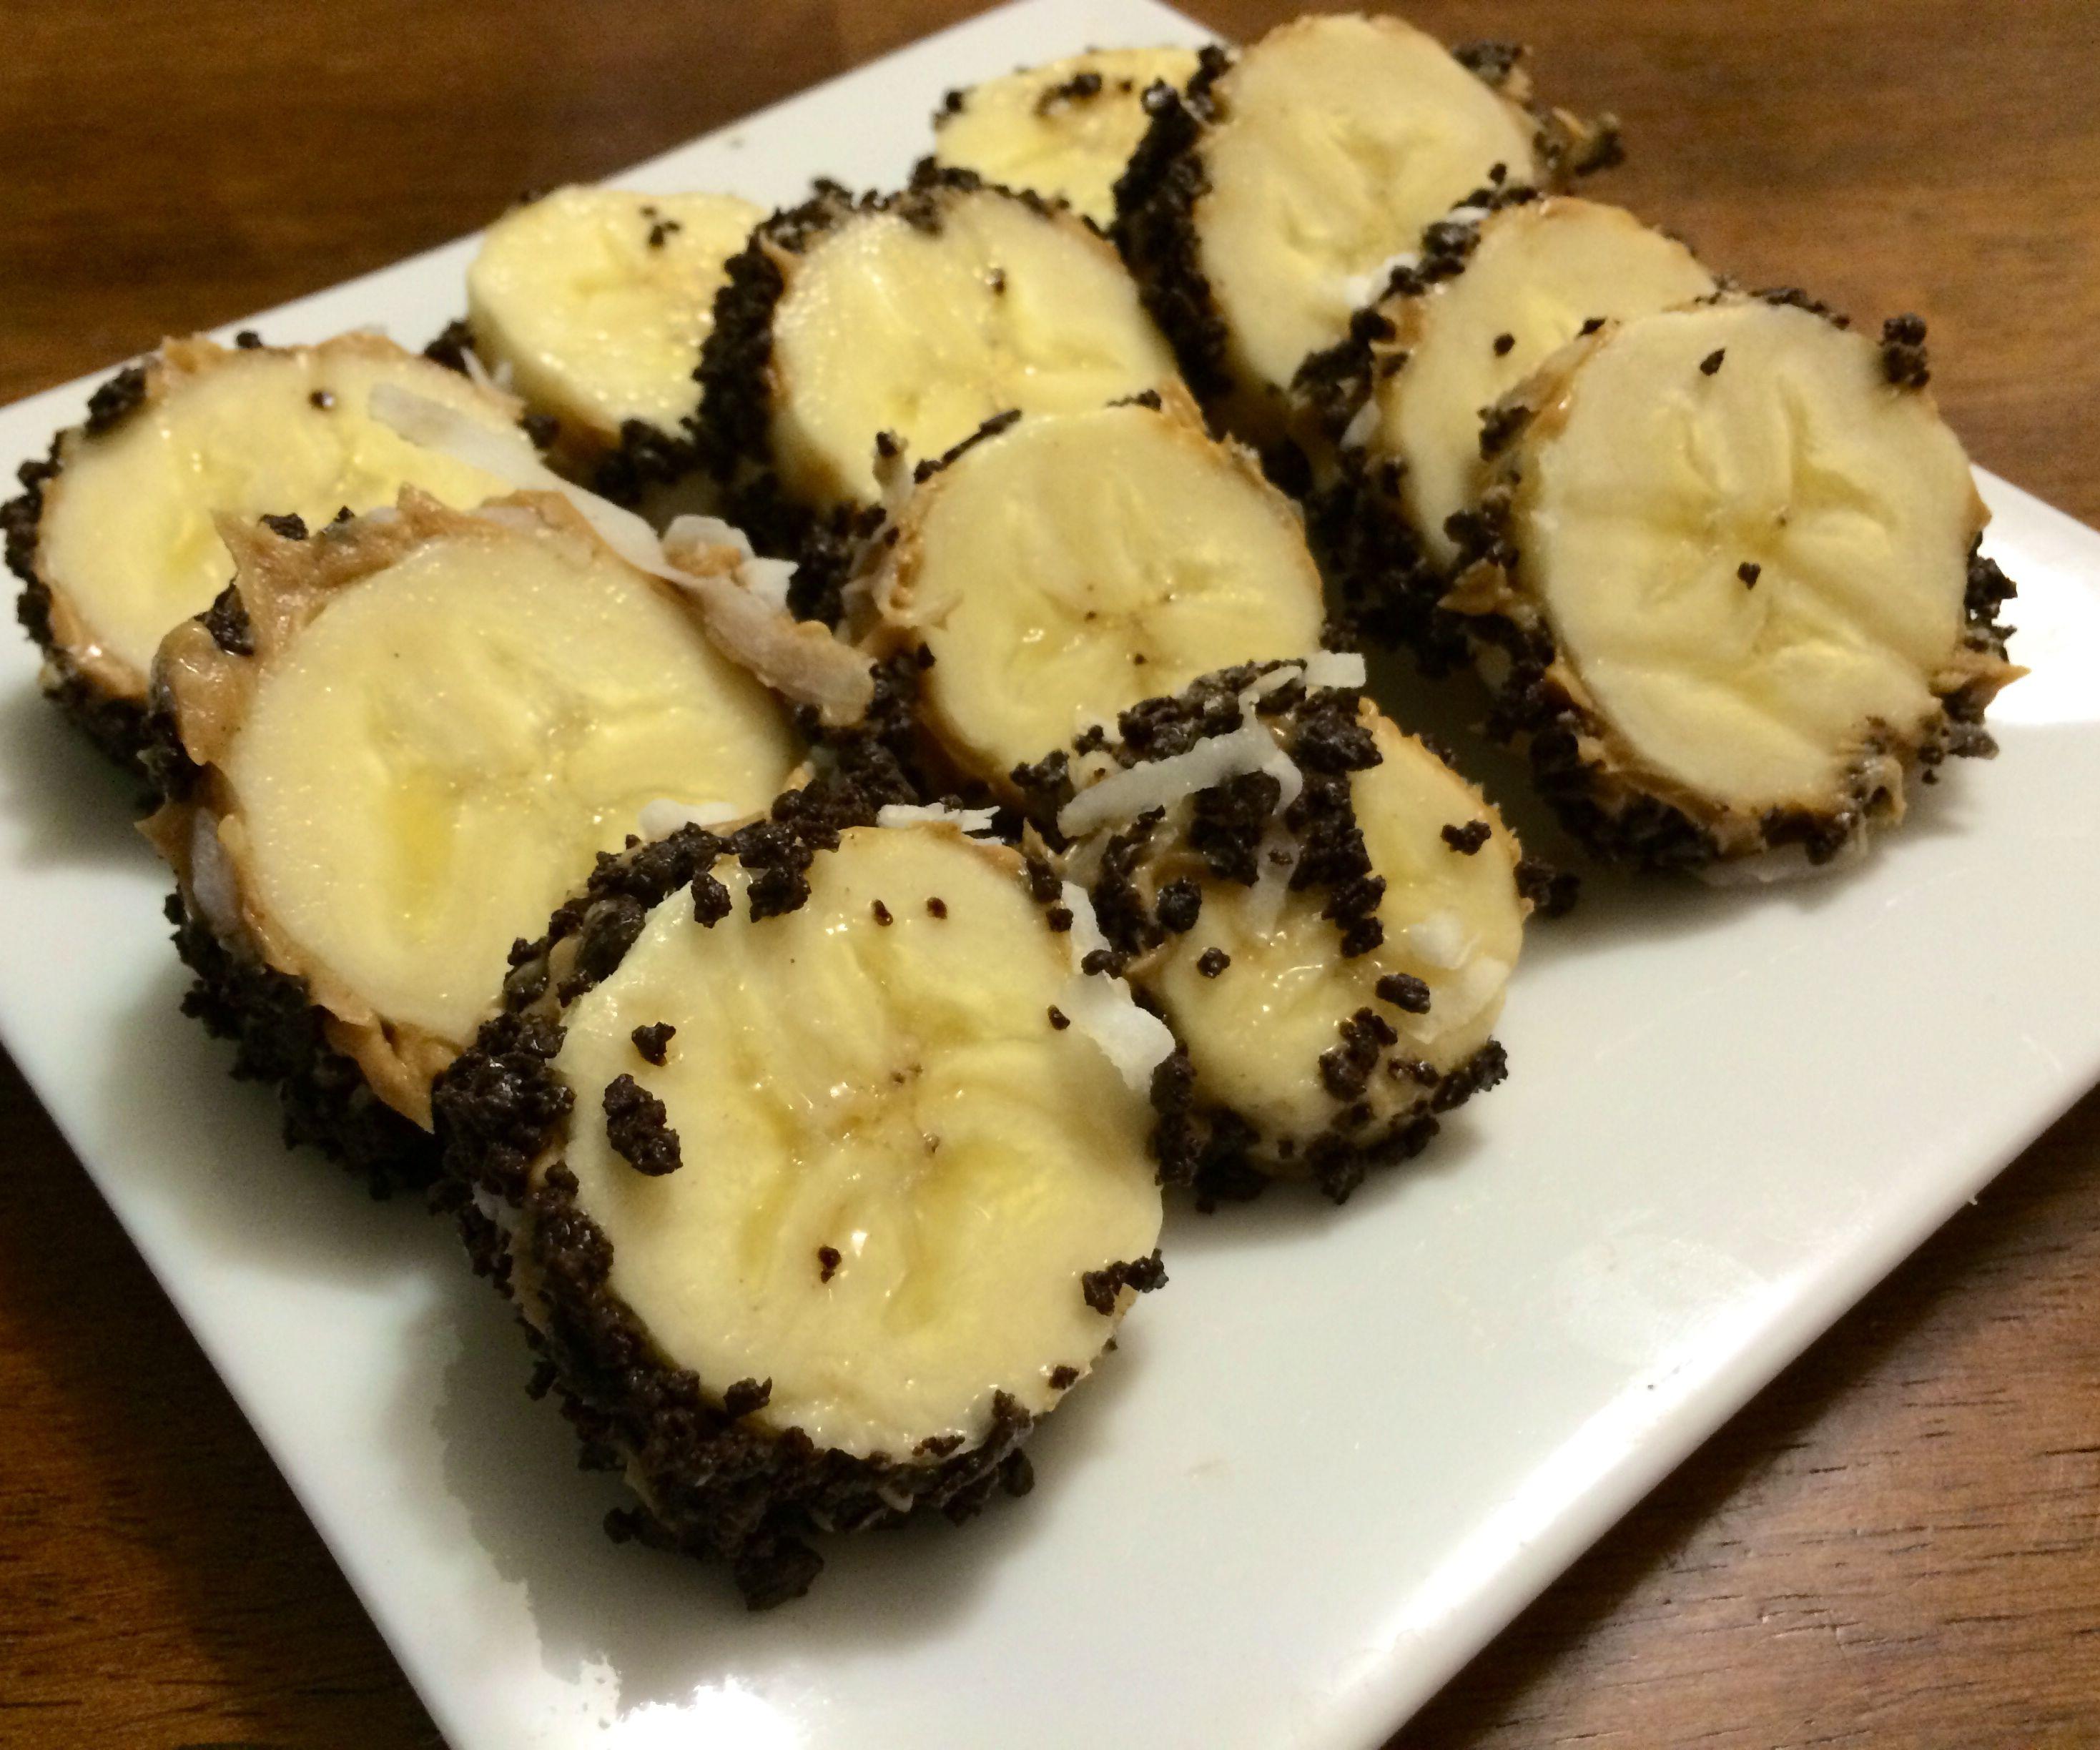 Dessert sushi or healthy banana snack? You decide.